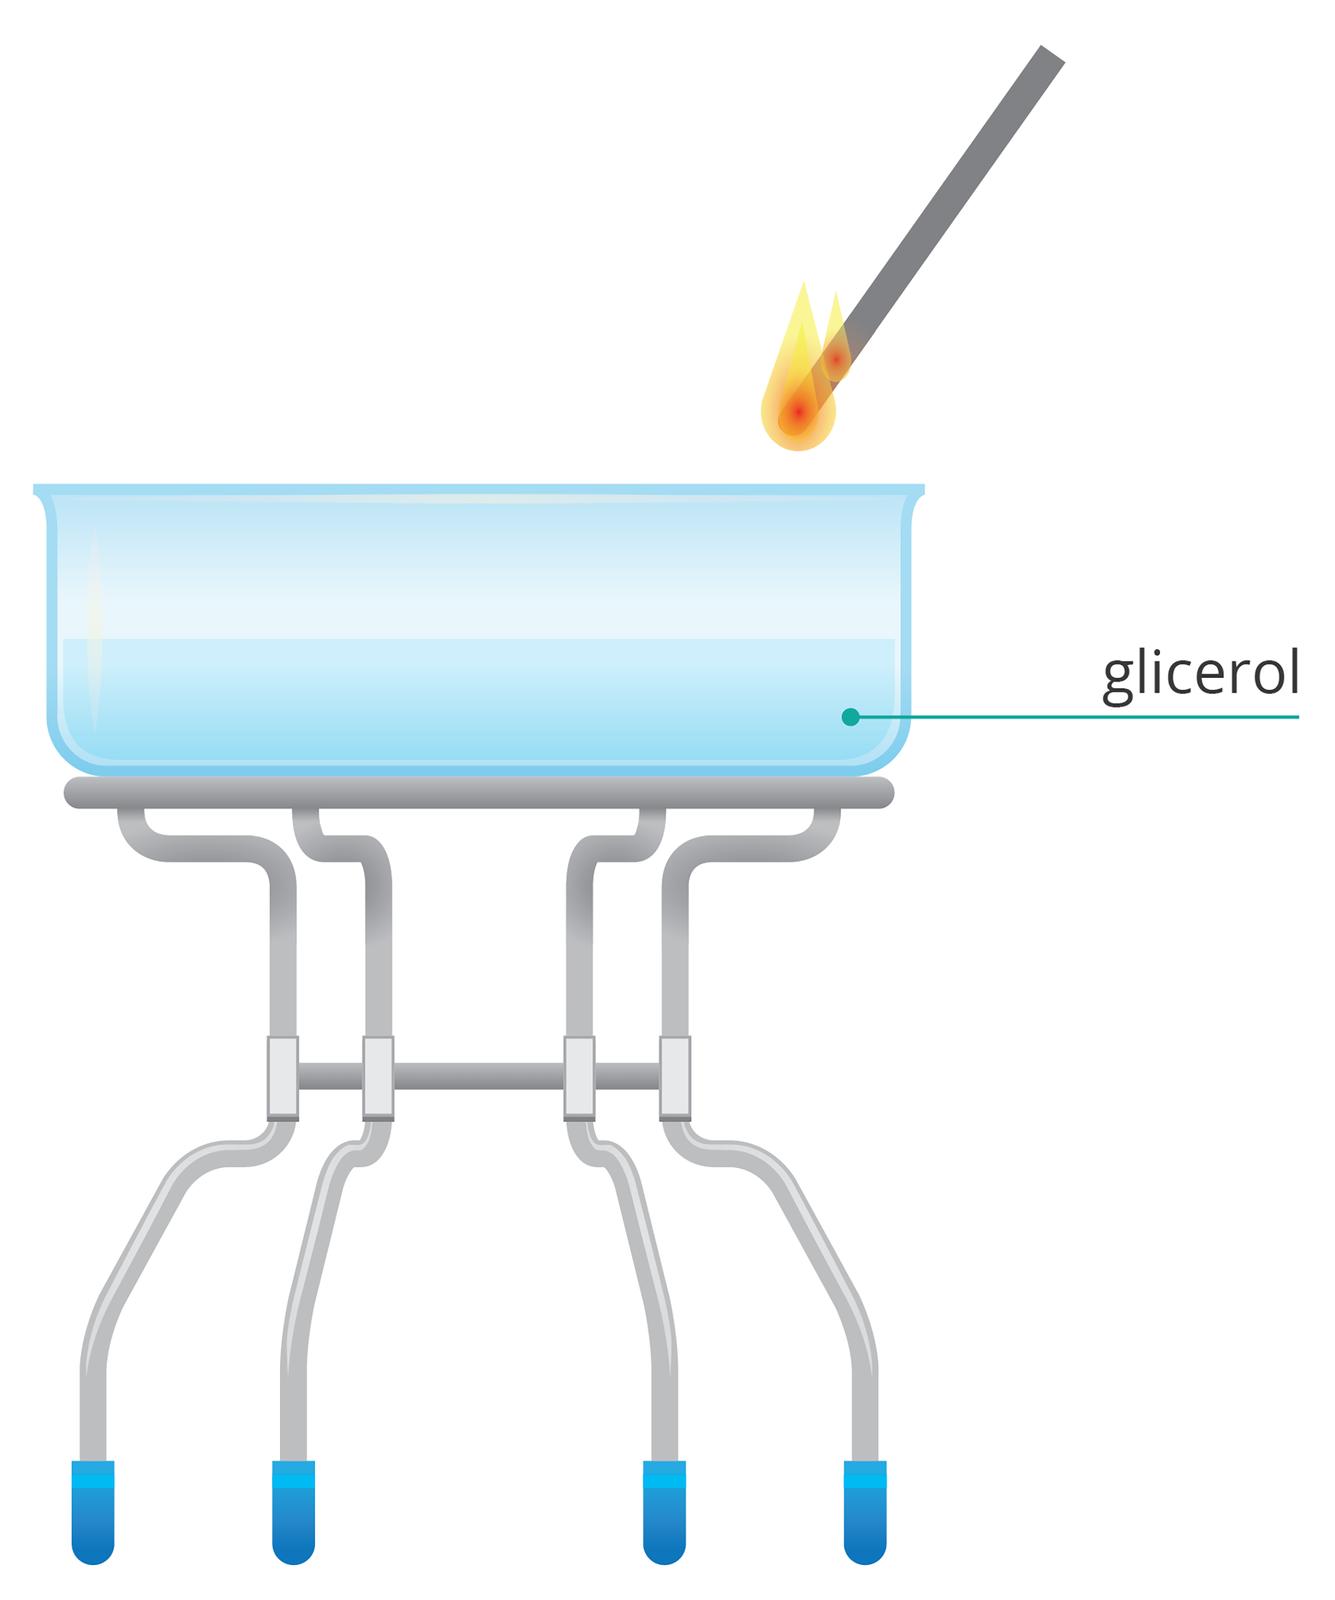 Schemat spalania glicerolu